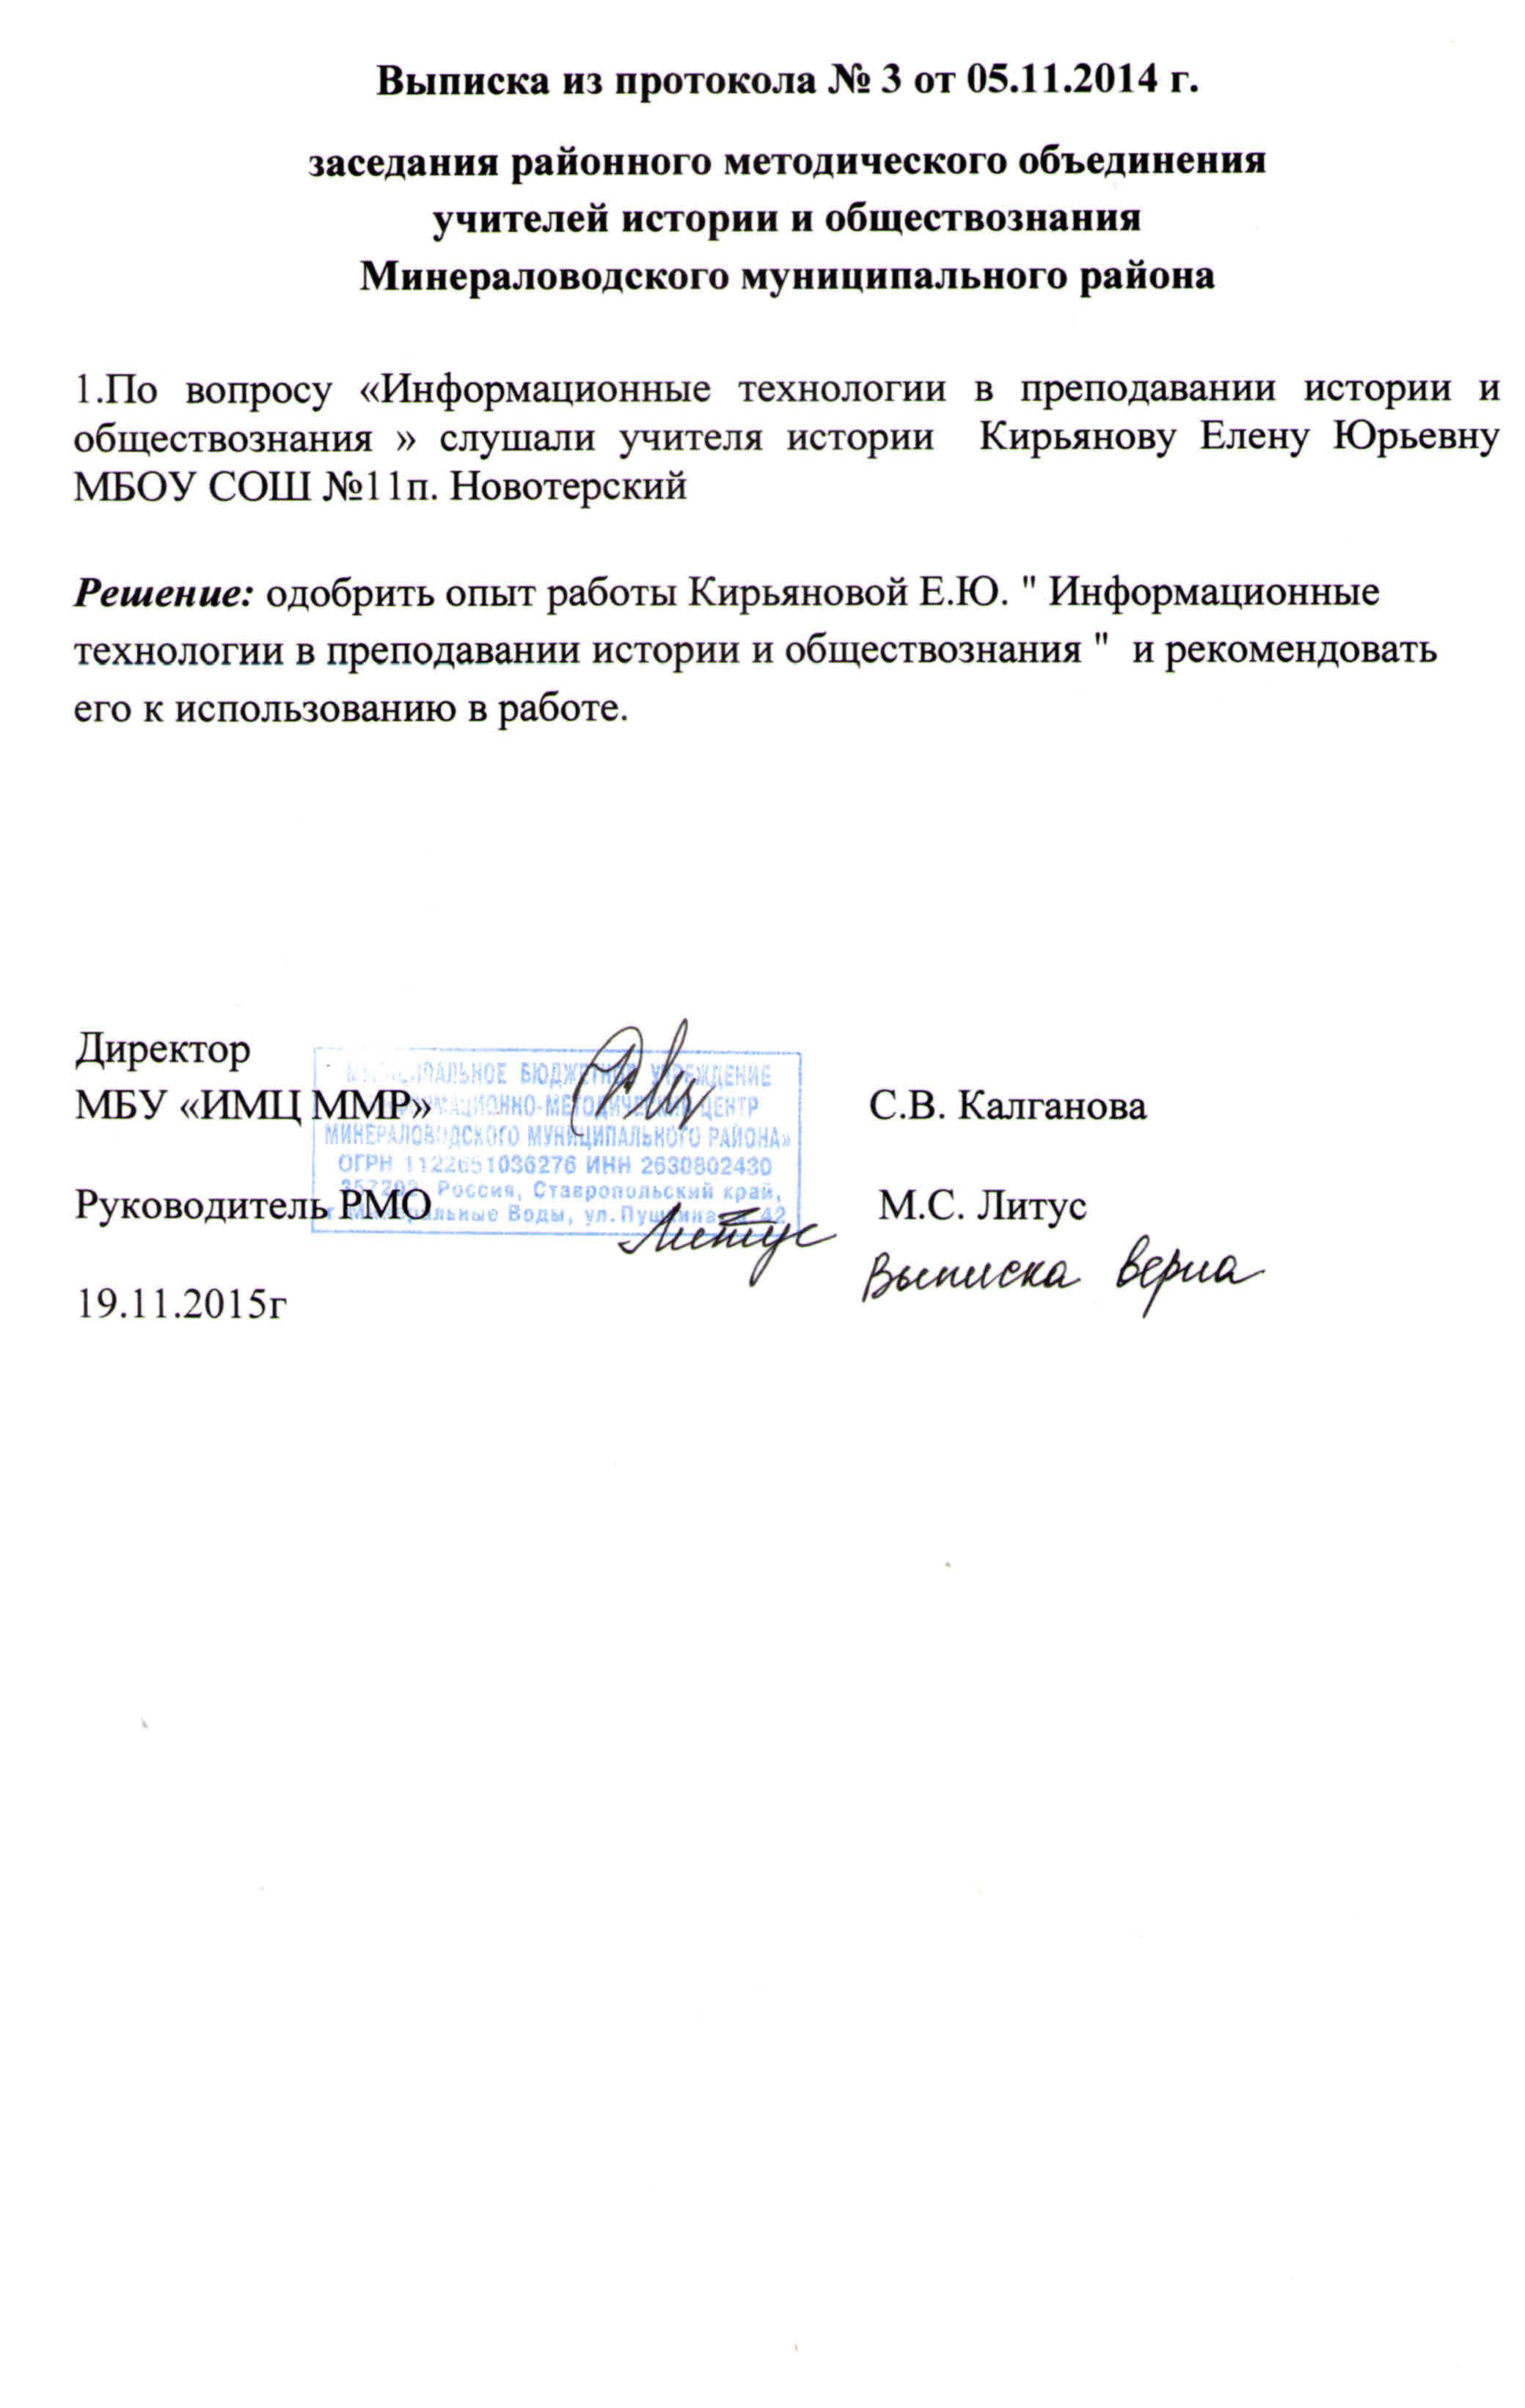 C:\Users\Сергей\Desktop\рмо\Document_3.jpg